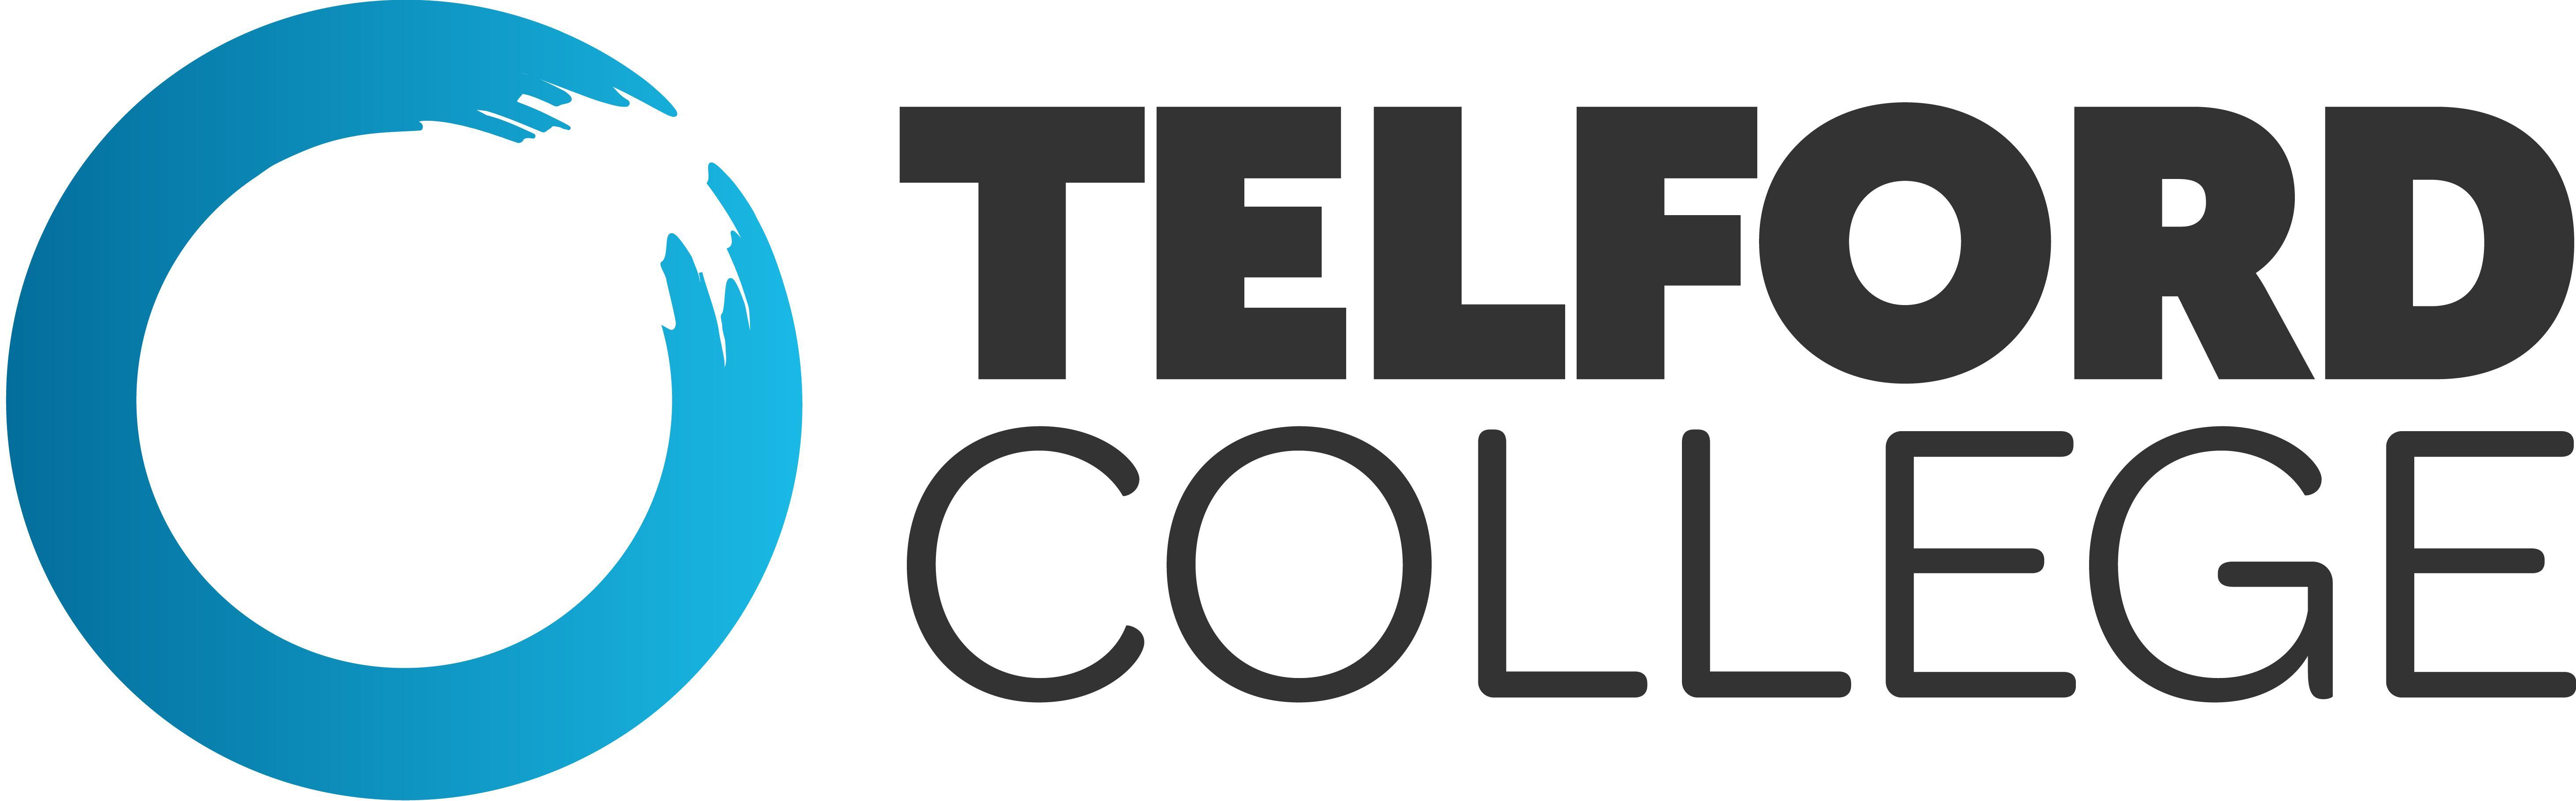 Telford College